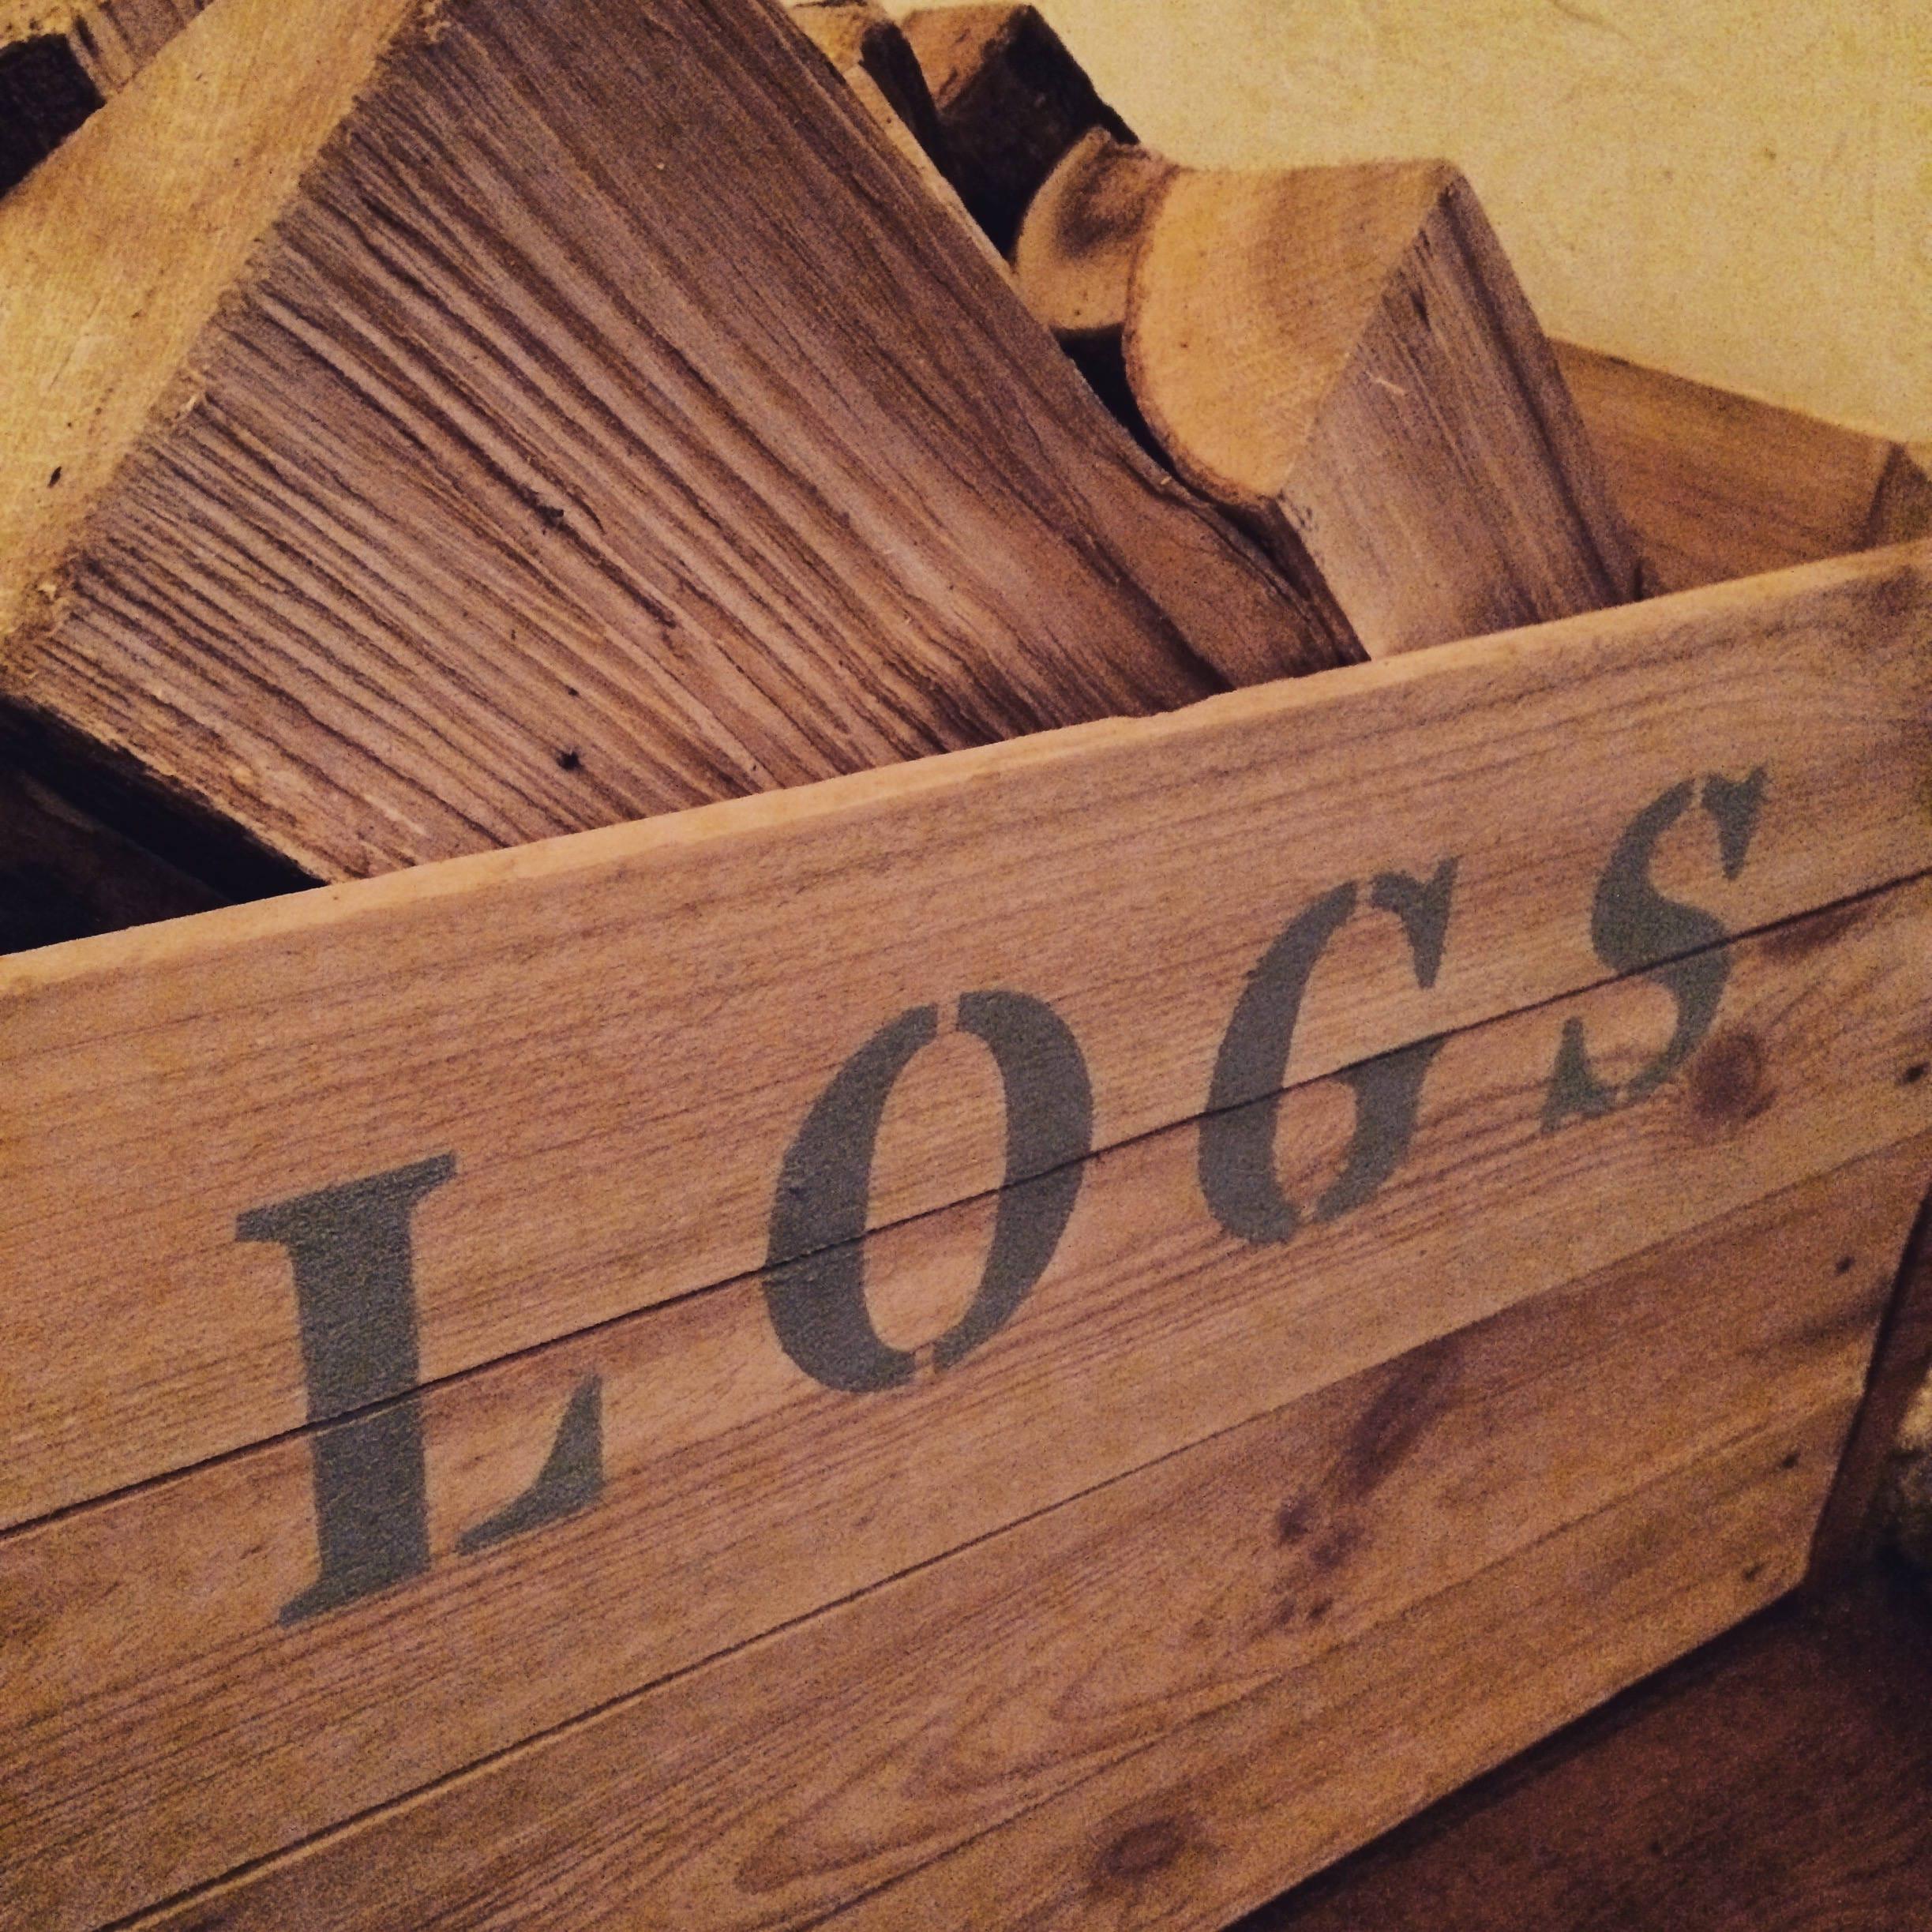 Rustic reclaimed vintage apple crate log storage box  caddy.